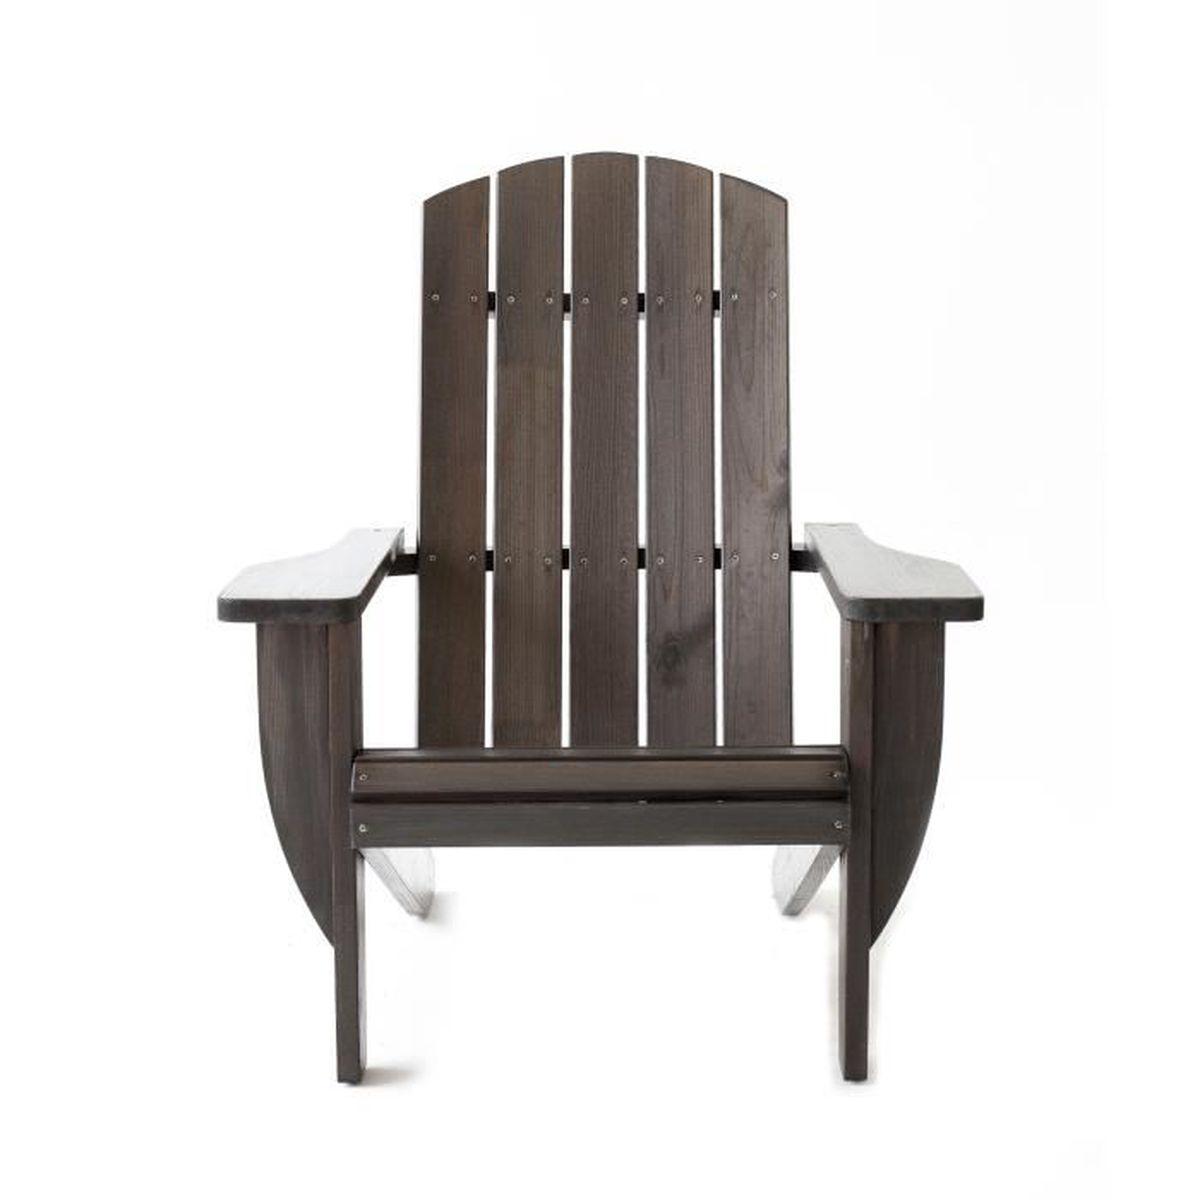 Coussin Pour Fauteuil Adirondack fauteuil de jardin adirondack ottawa en pin massif, tongris